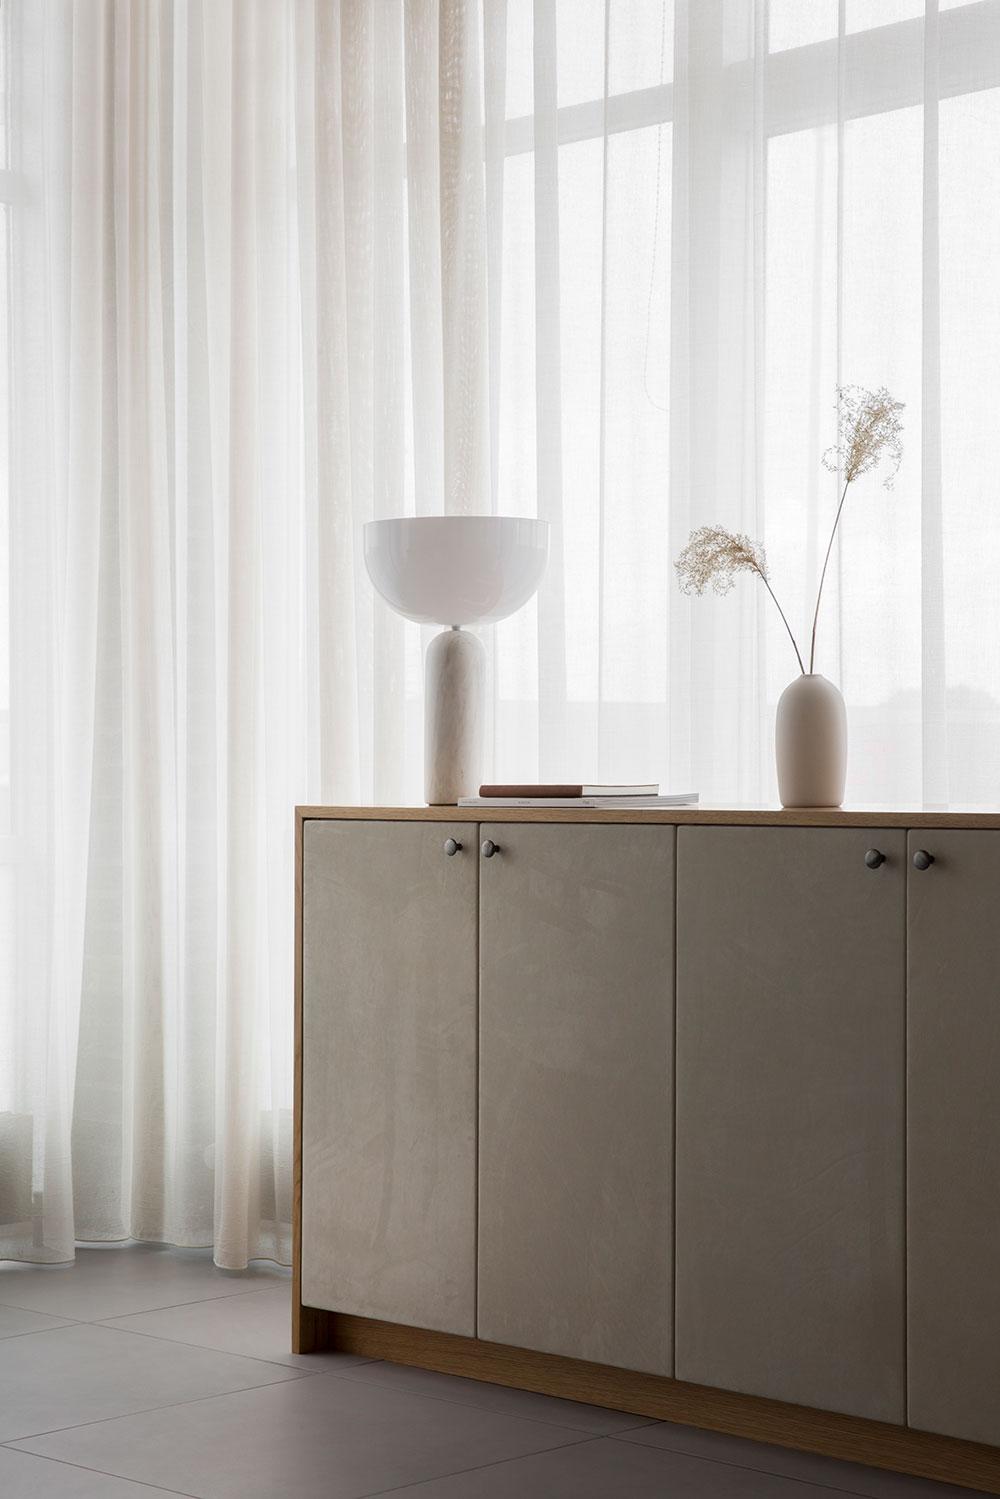 Soft minimalism interior at Sørensen Leather's new HQ in Aarhus